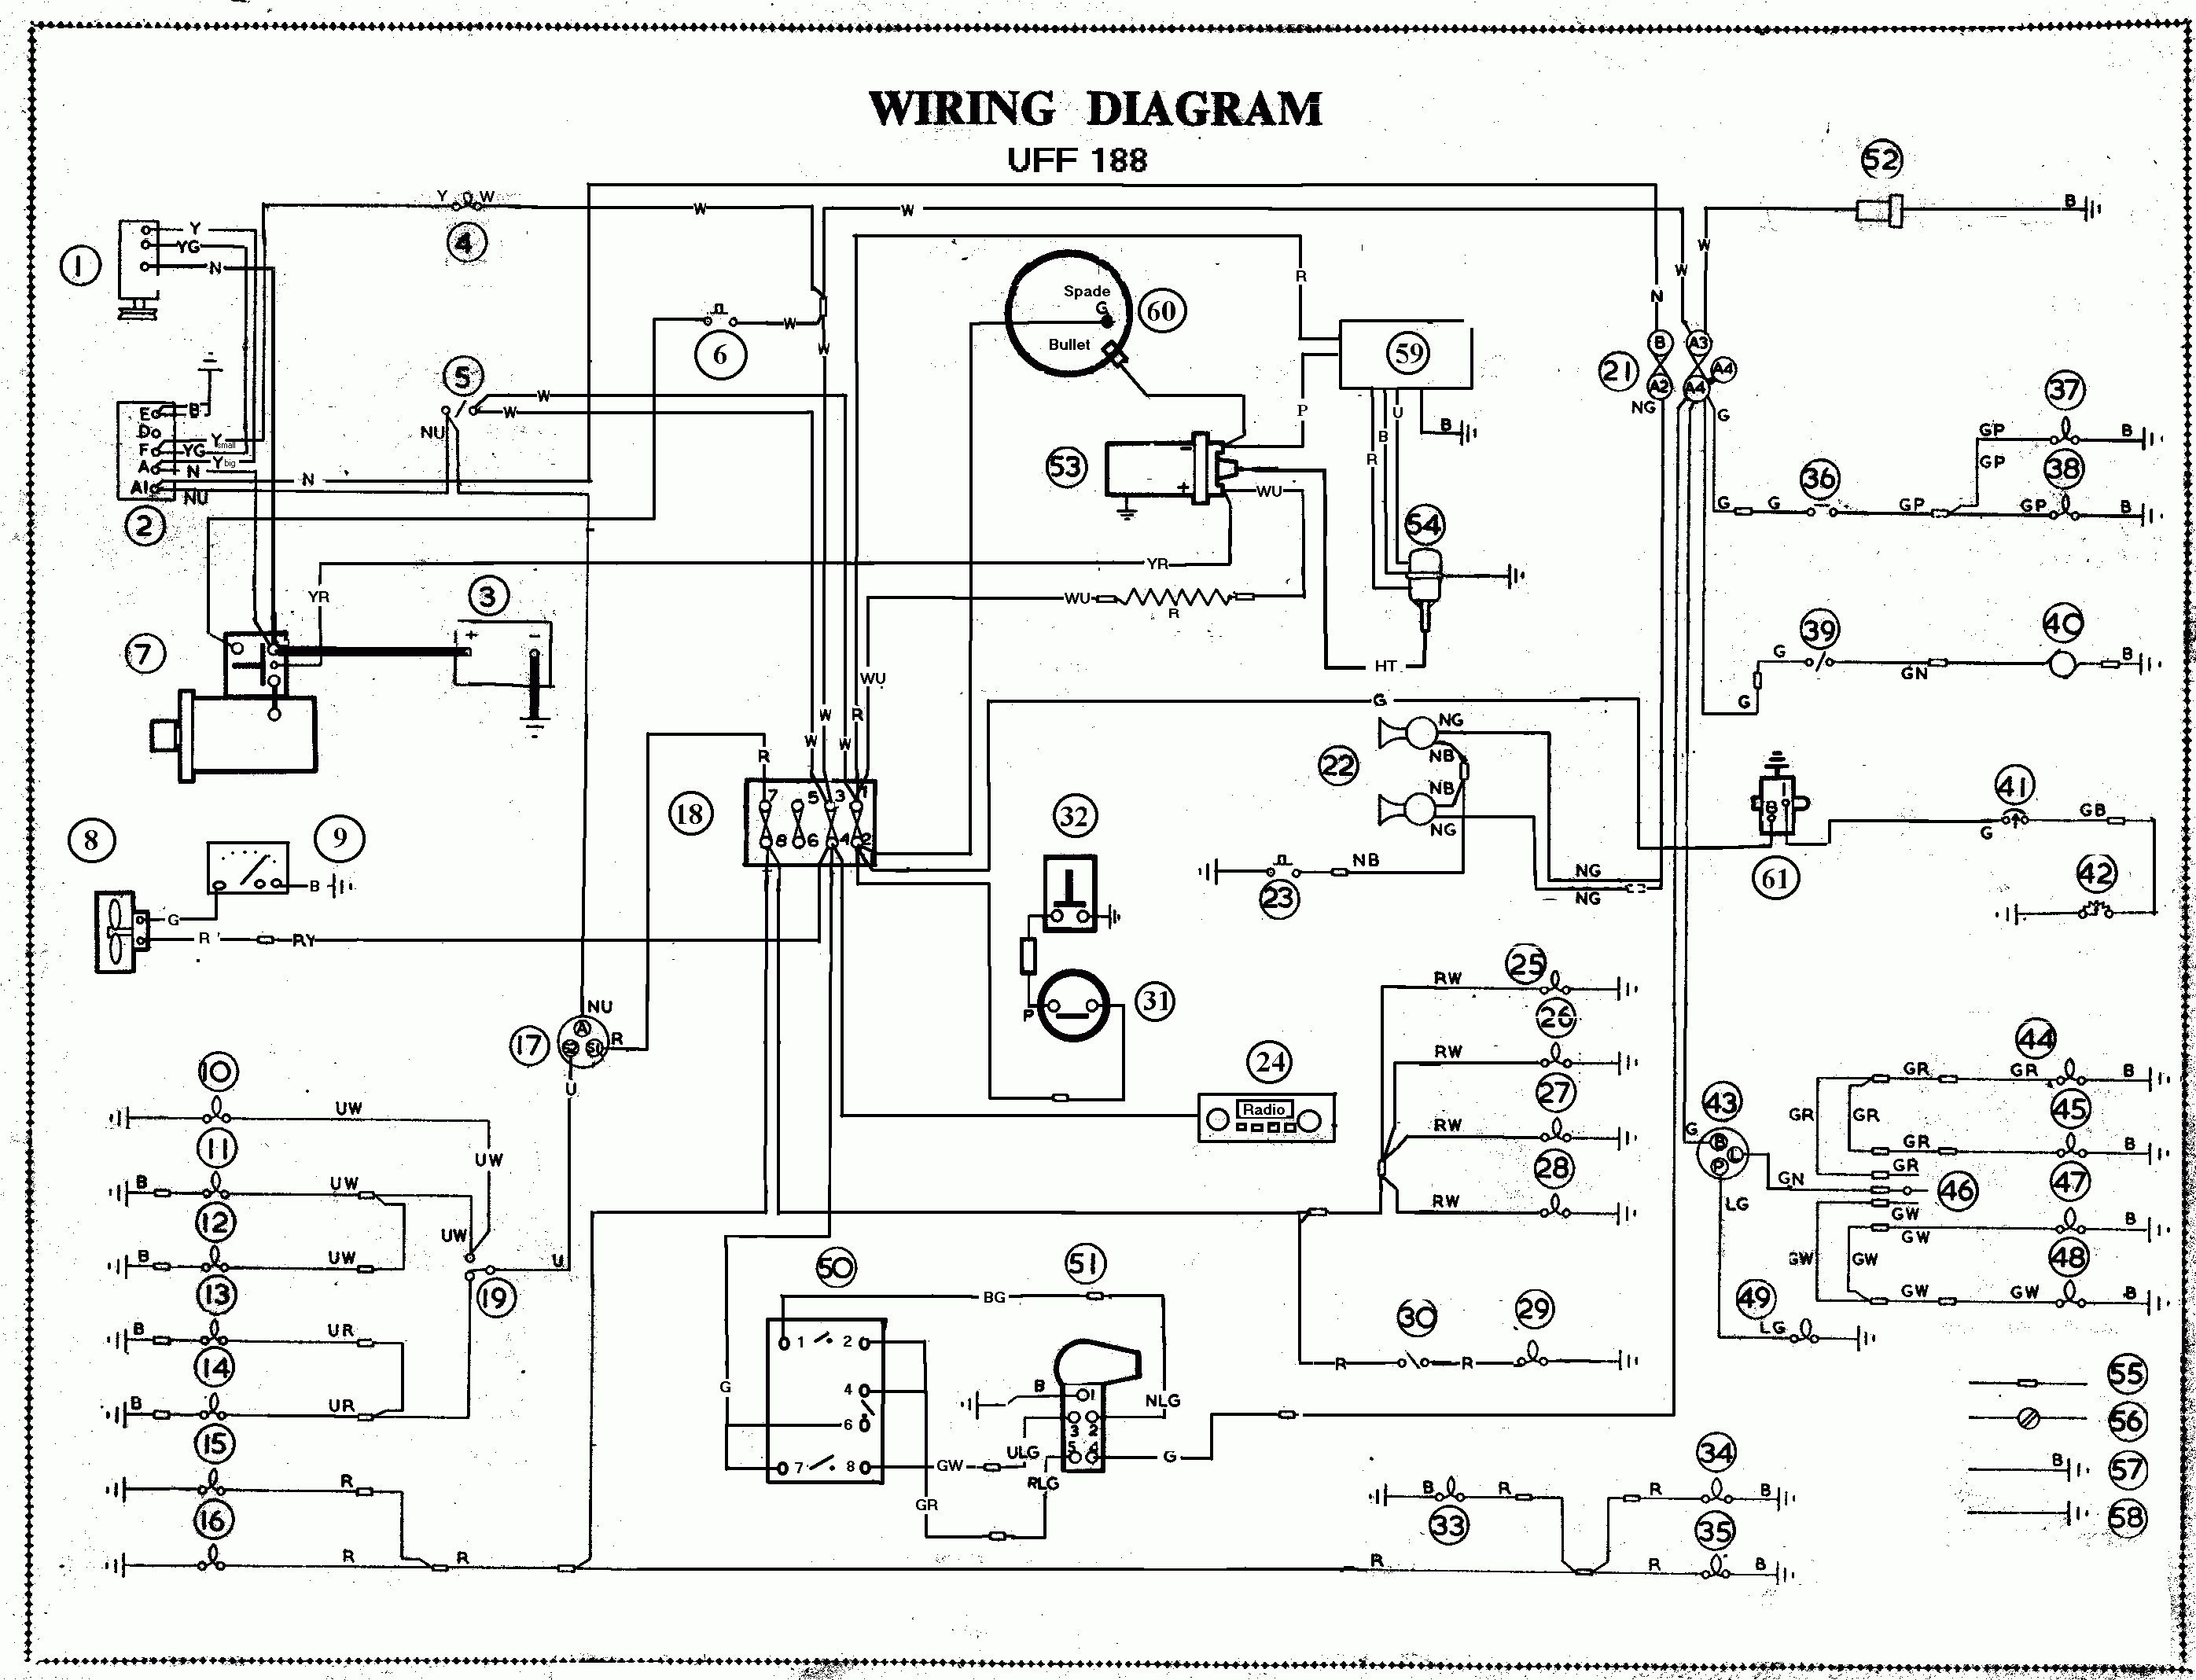 Motorcycle Wiring Diagram Download | Wiring Diagram - Motorcycle Ignition Switch Wiring Diagram